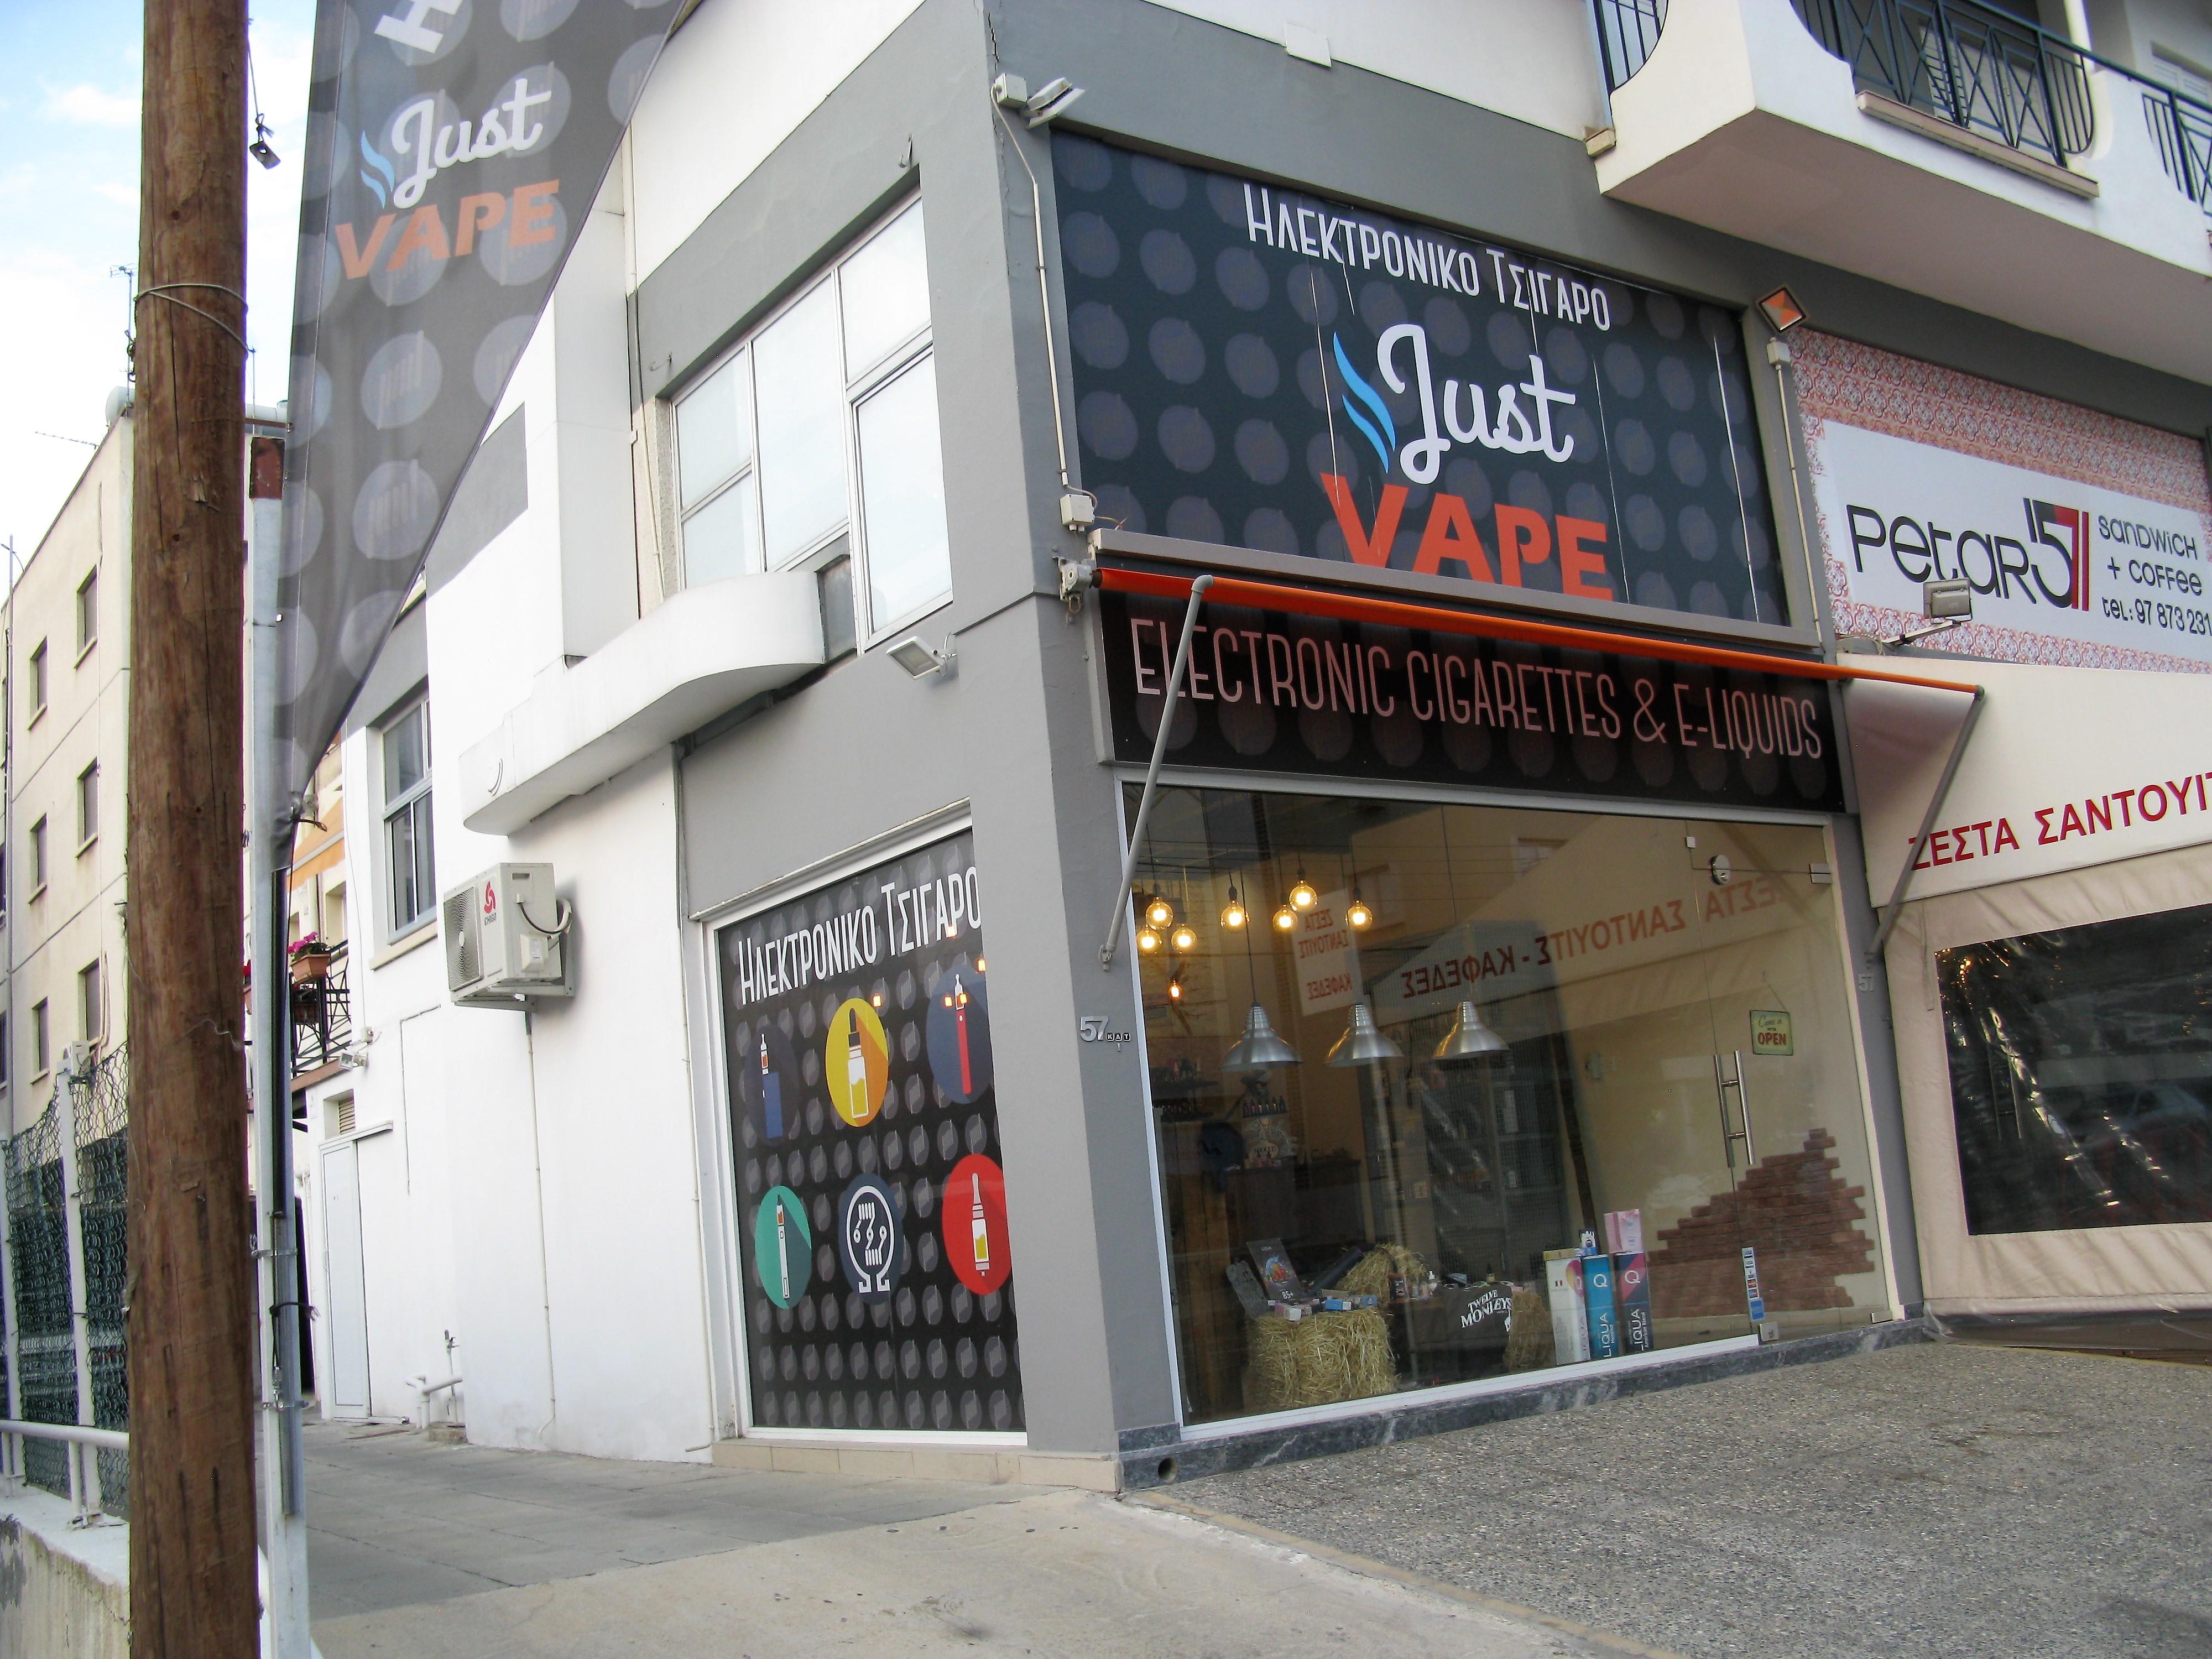 justvape-store-pic2.jpg